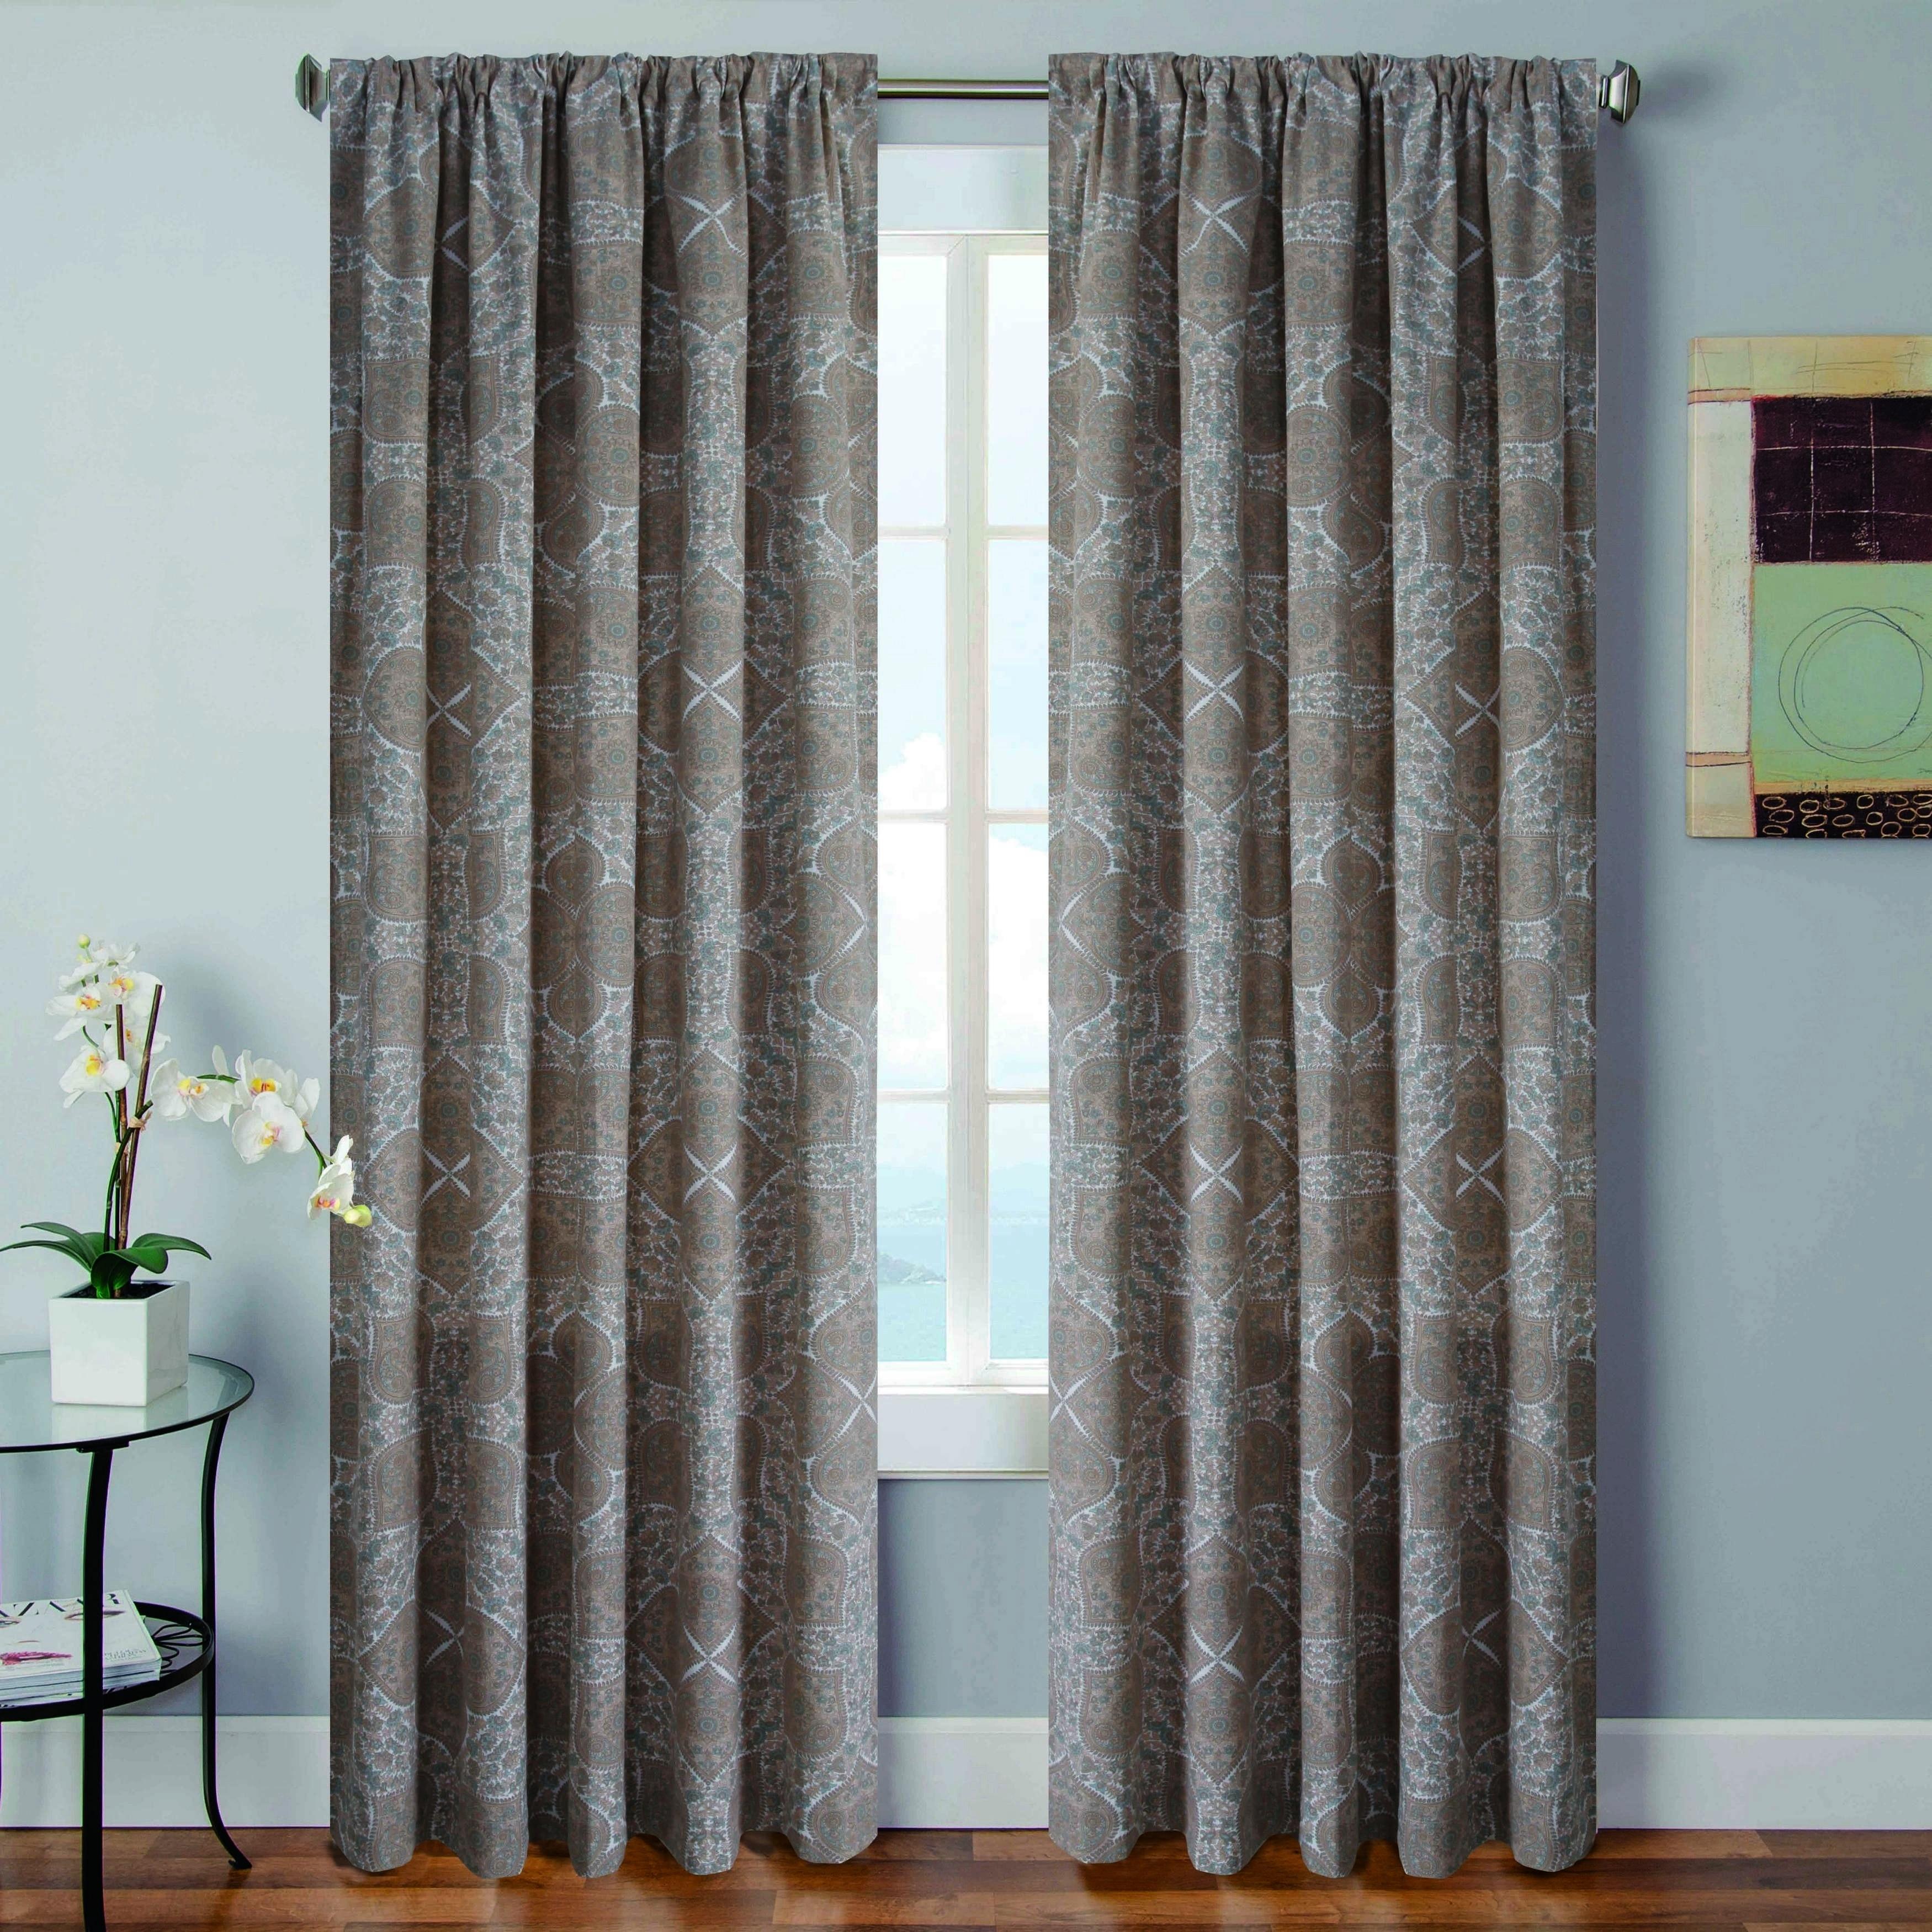 Vera Tarah 96 Inch Curtain Panel Pair 52x96 Free Shipping Today 18092360